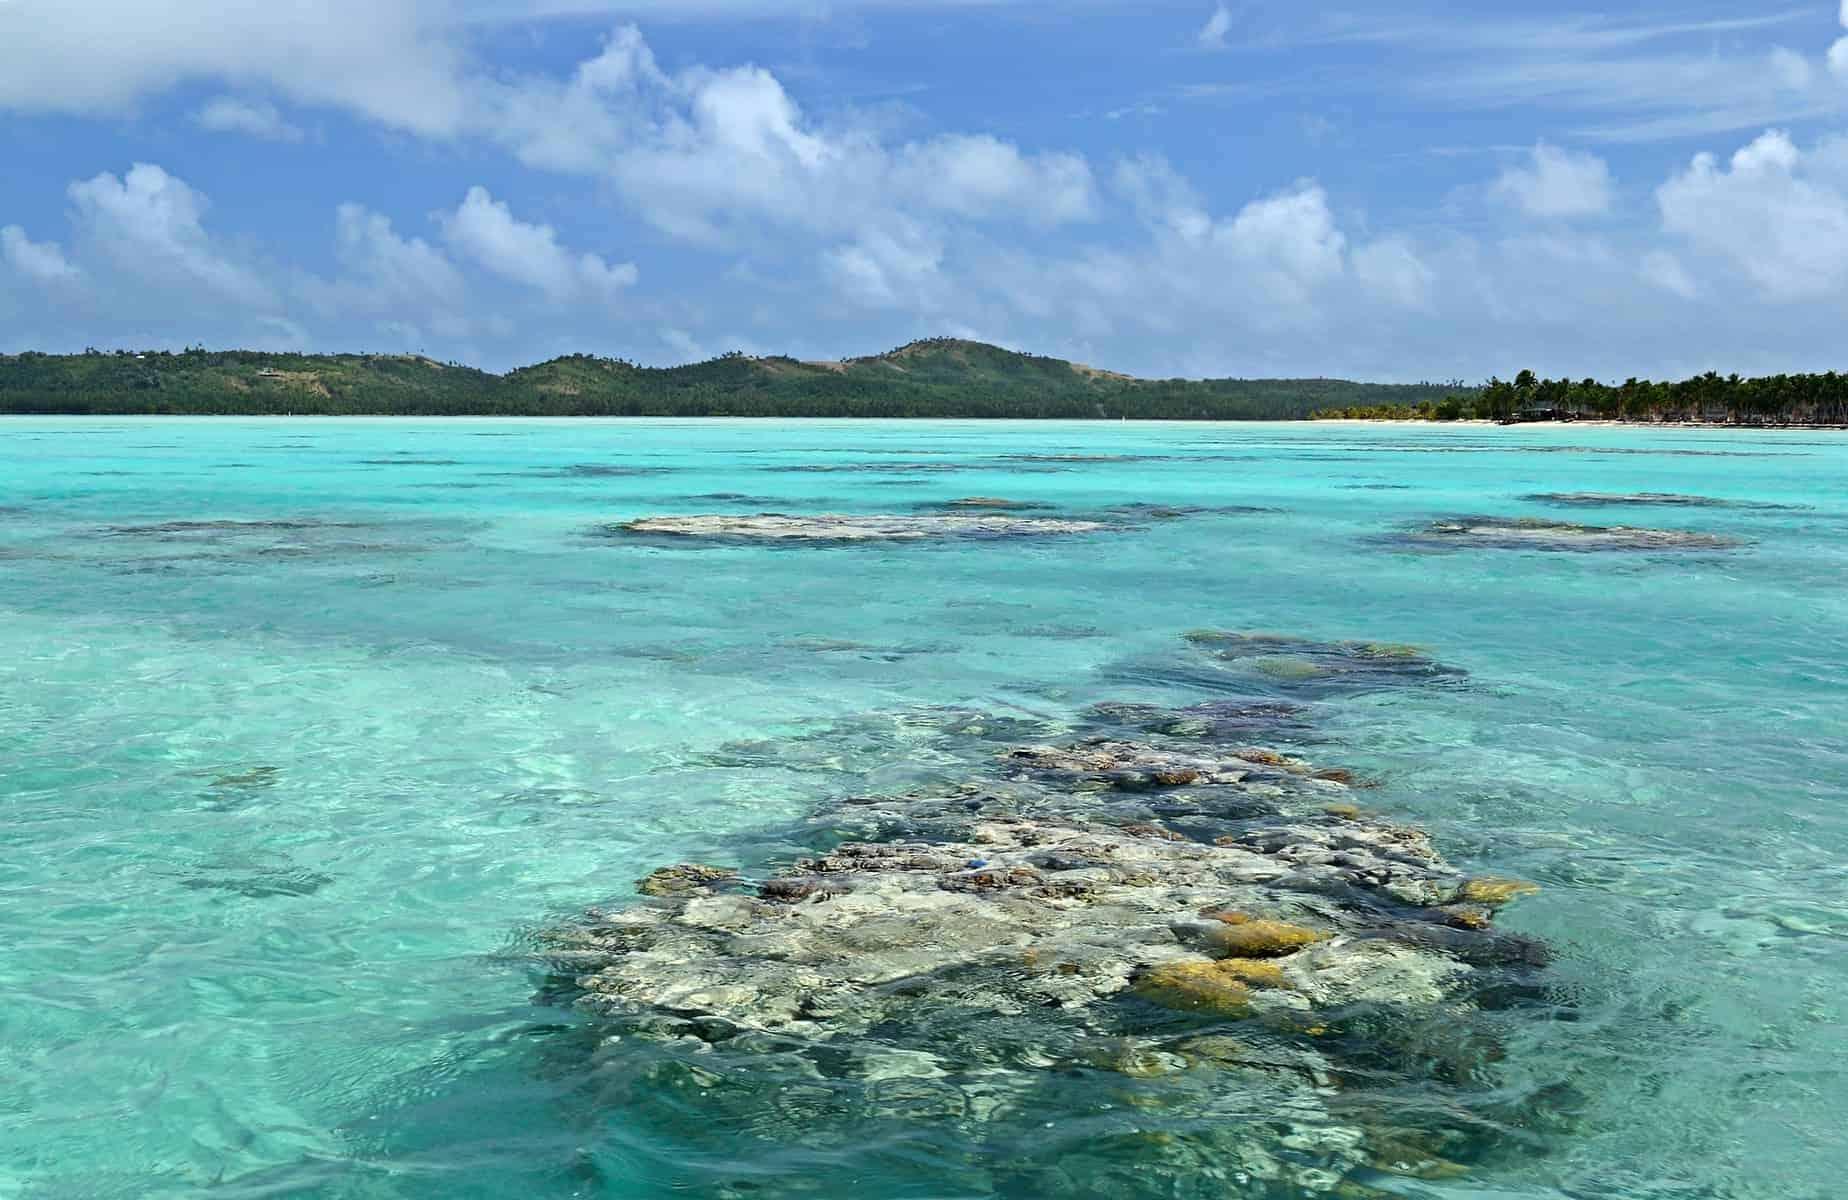 Cooks islands